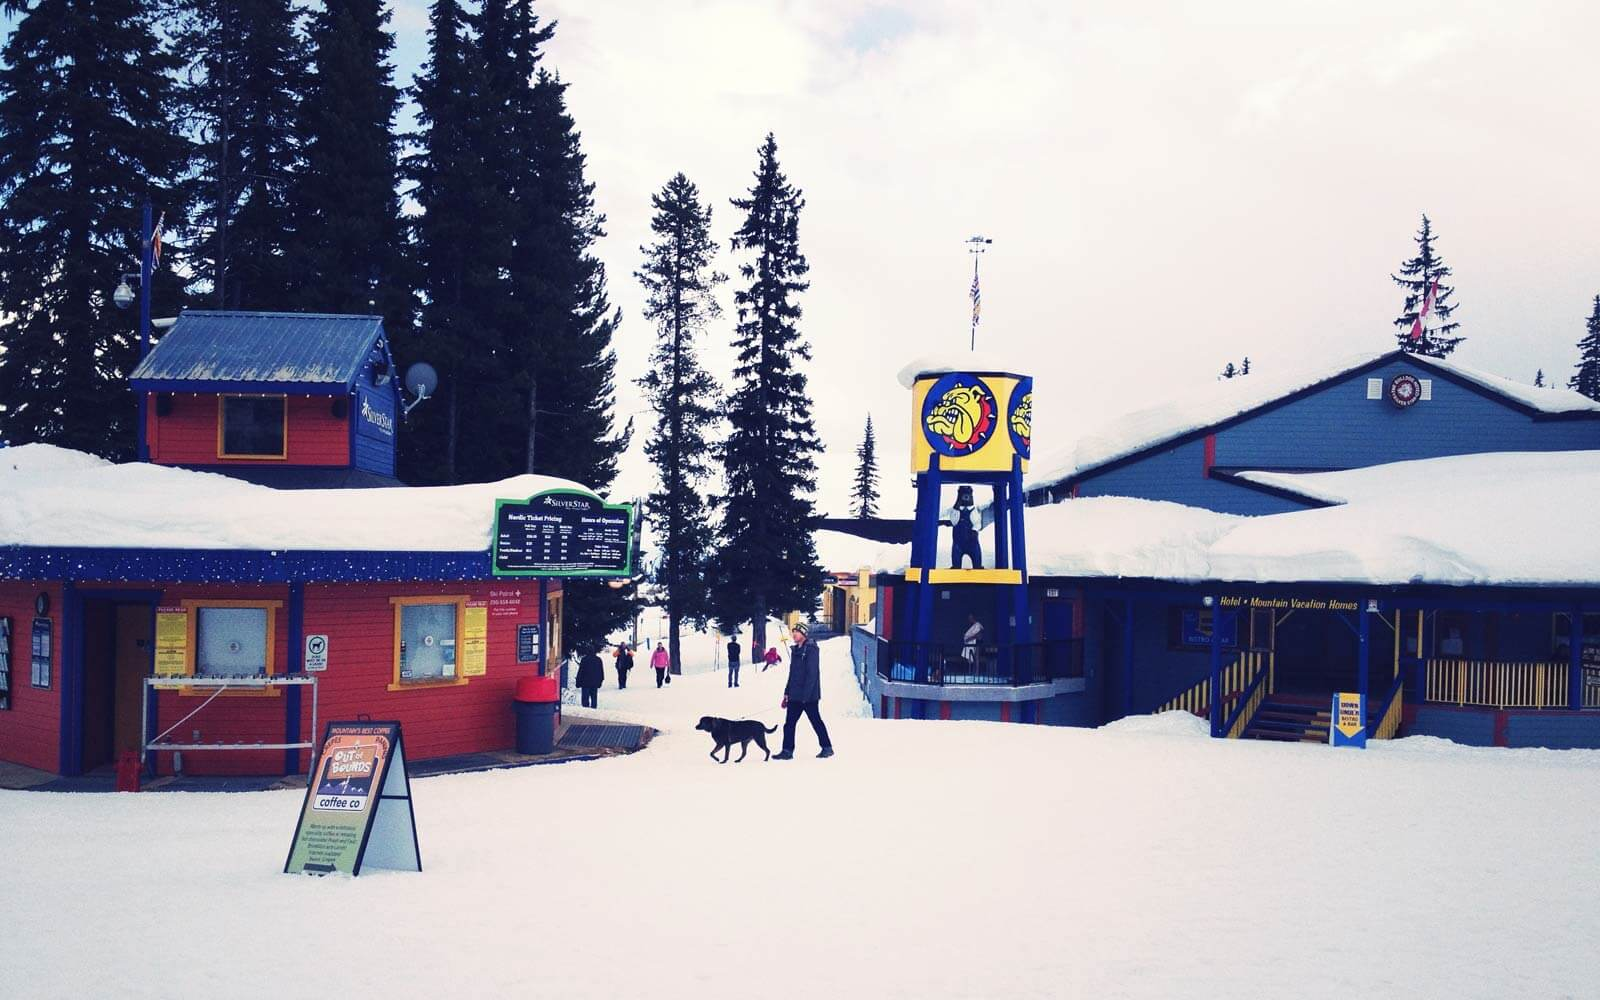 Schnee-Silverstar-Kanada